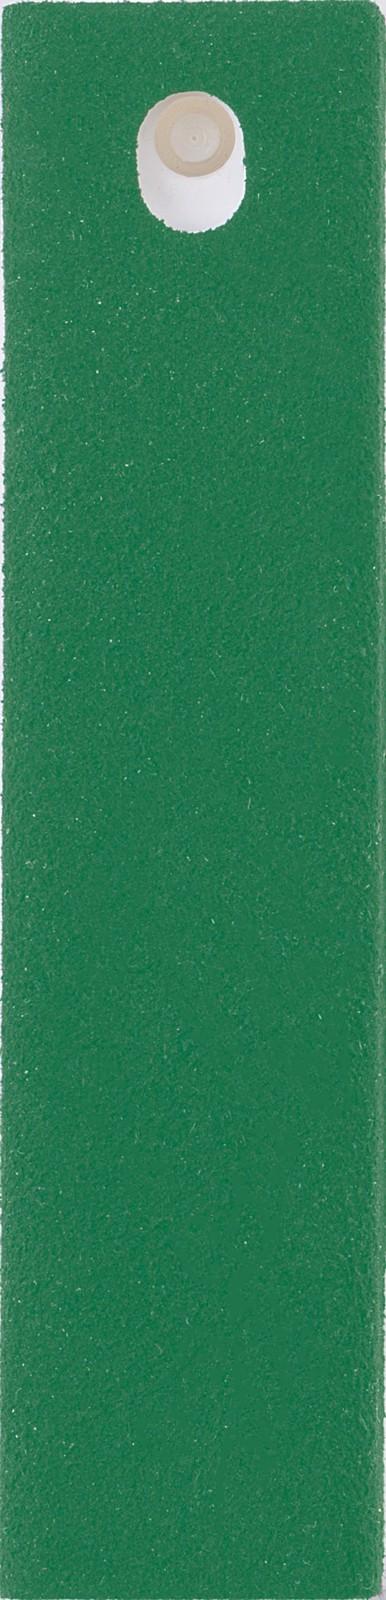 PP screen cleaner spray - Green